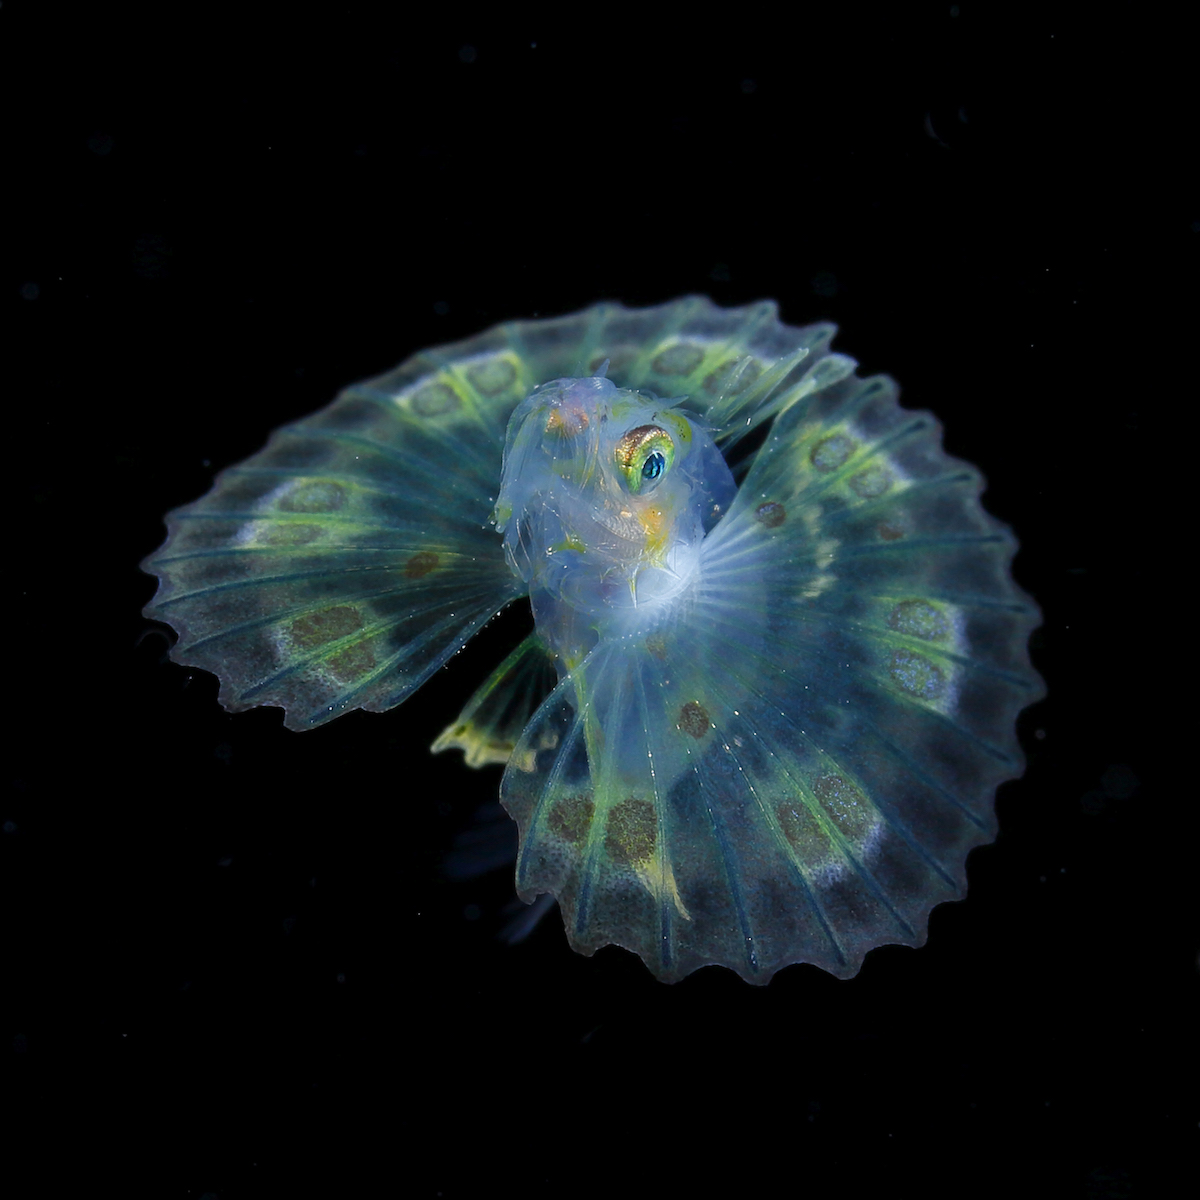 clip Stunning Underwater Photos of Microscopic Plankton by Ryo